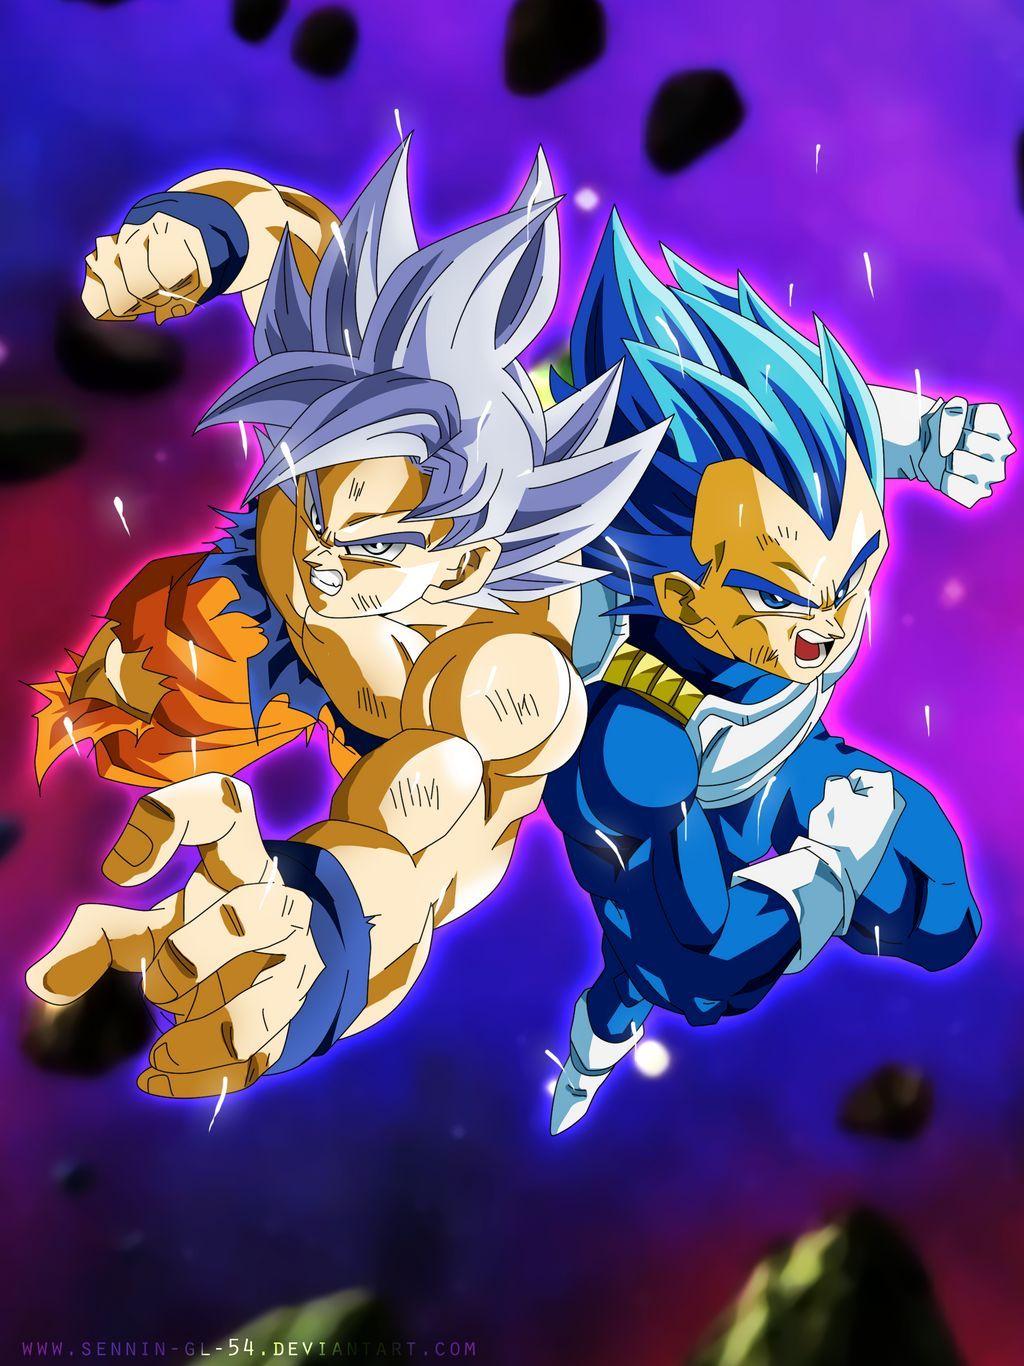 Goku And Vegeta Universe Survival By Sennin Gl 54 On Deviantart Anime Dragon Ball Super Goku And Vegeta Dragon Ball Super Goku